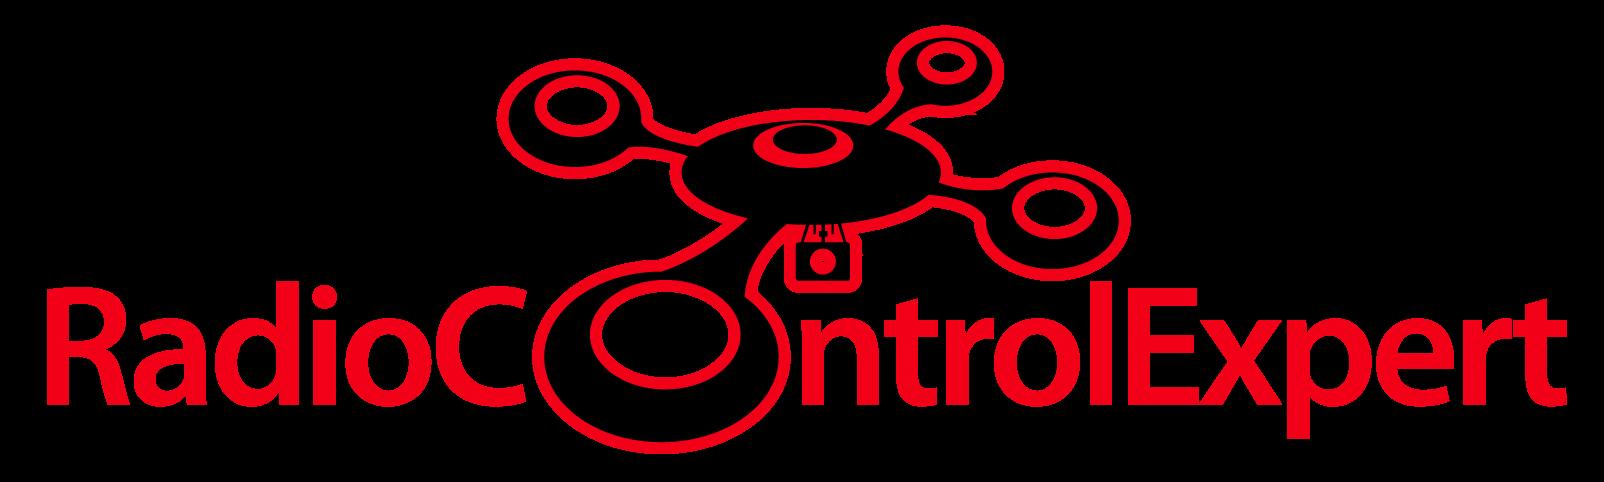 RadioControlExpert